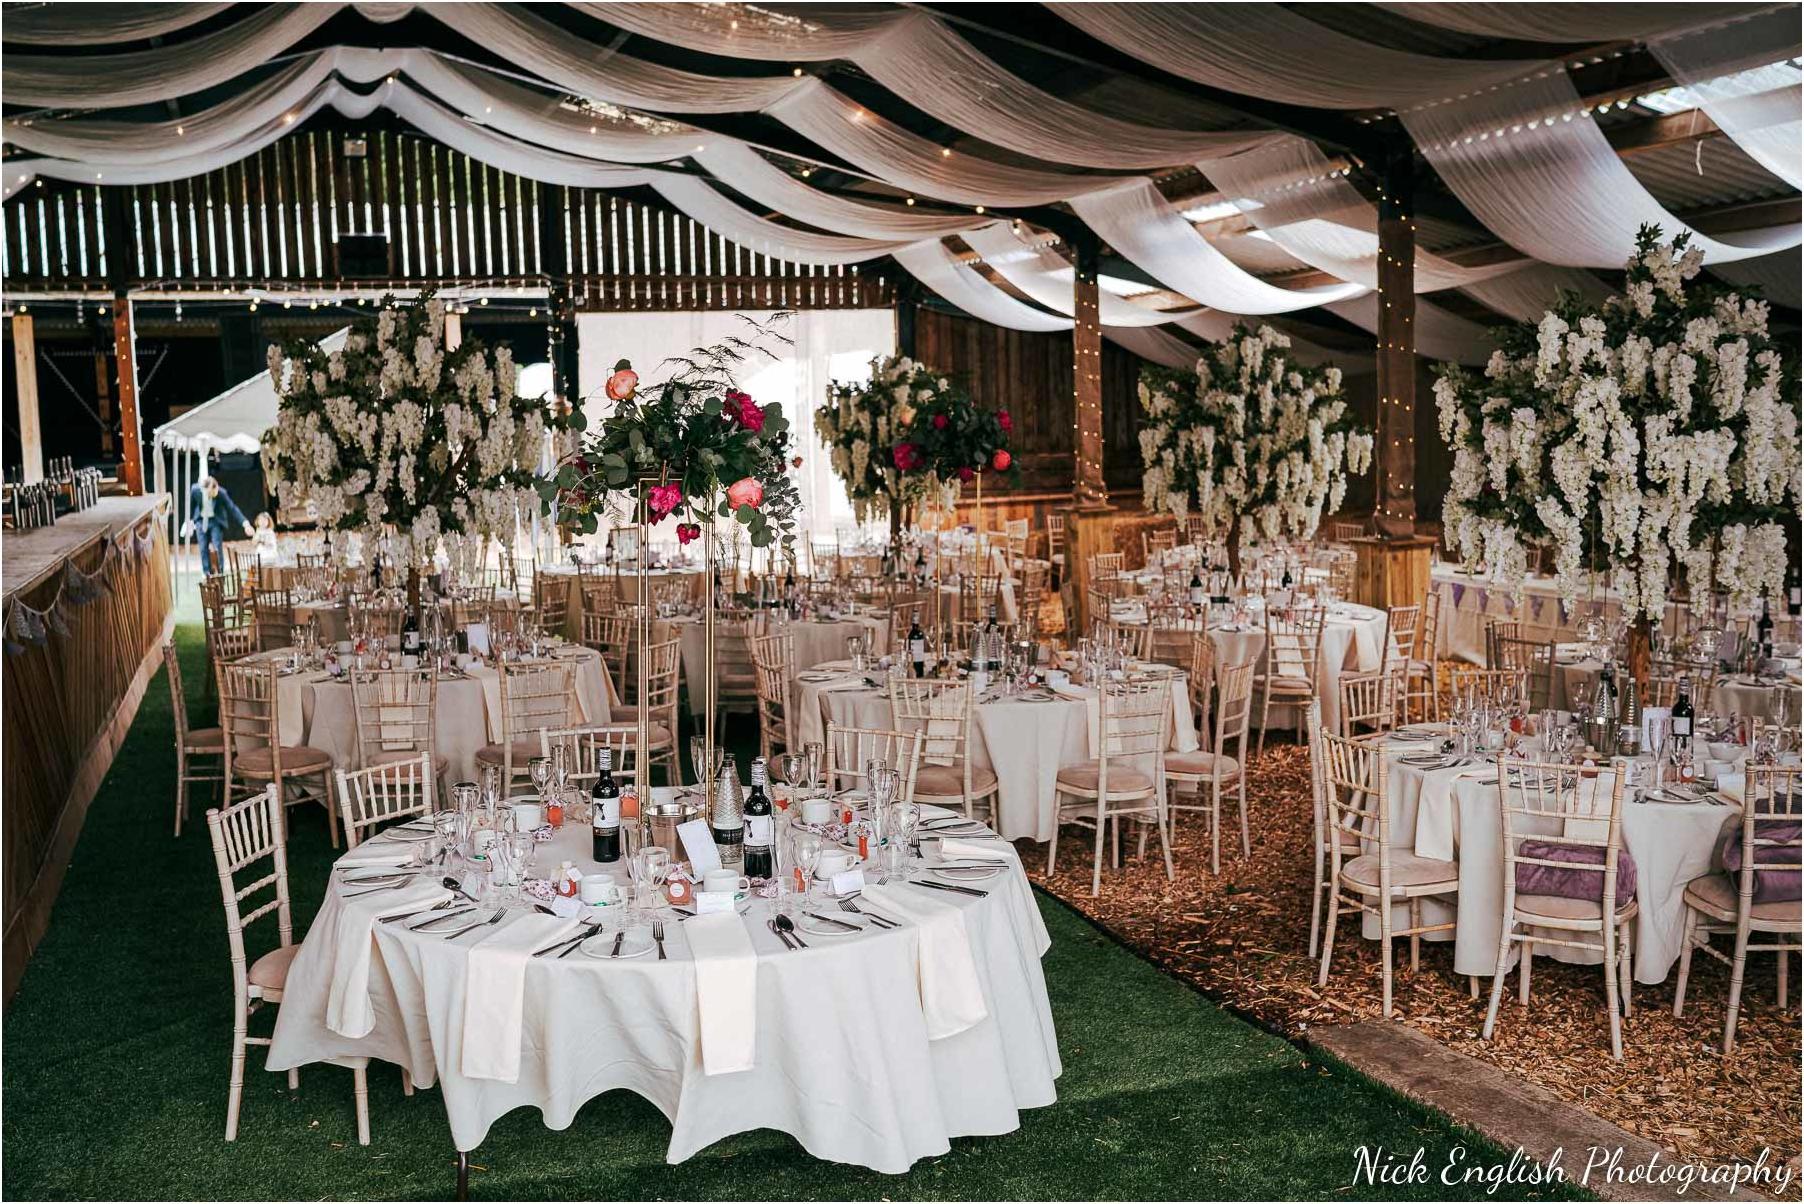 Whitebottom_Farm_Wedding_Manchester_Photograph-50.jpg